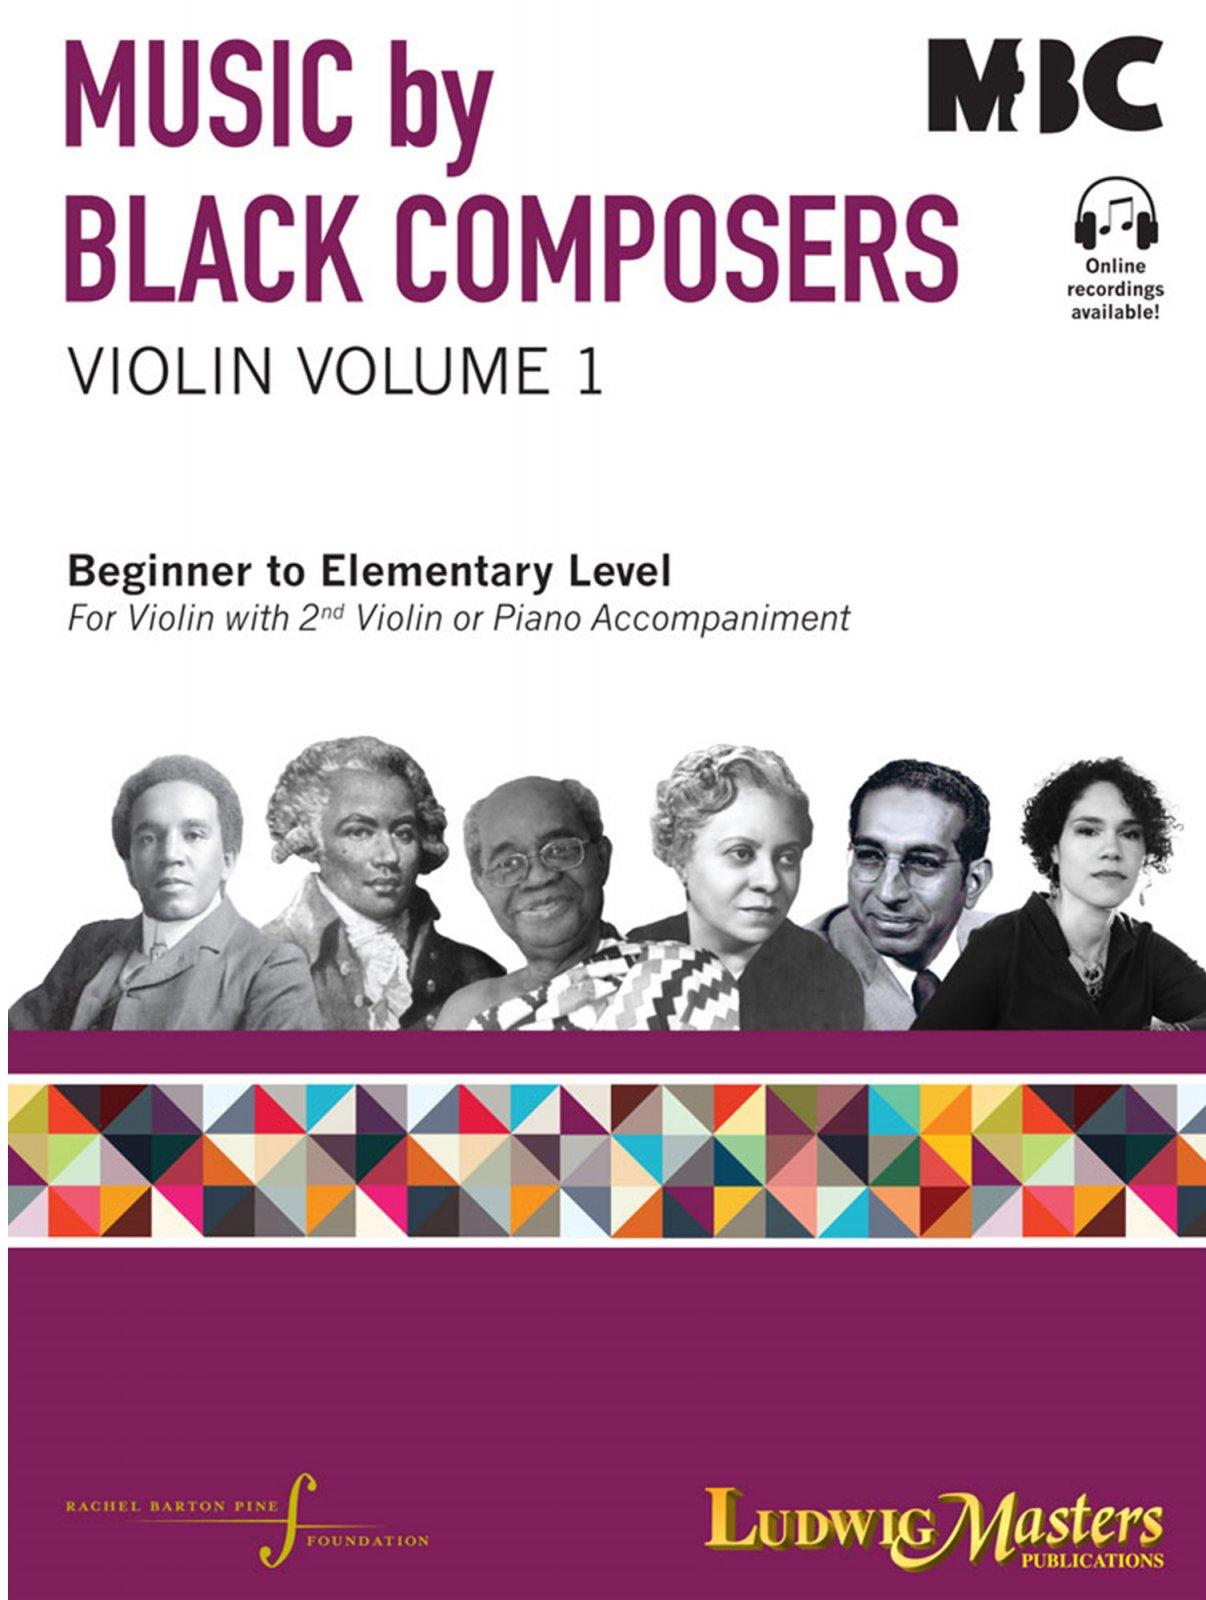 Music by Black Composers - Violin Volume 1 - Various - Arr. Rachel Barton Pine -  Violin Piano - Ludwig